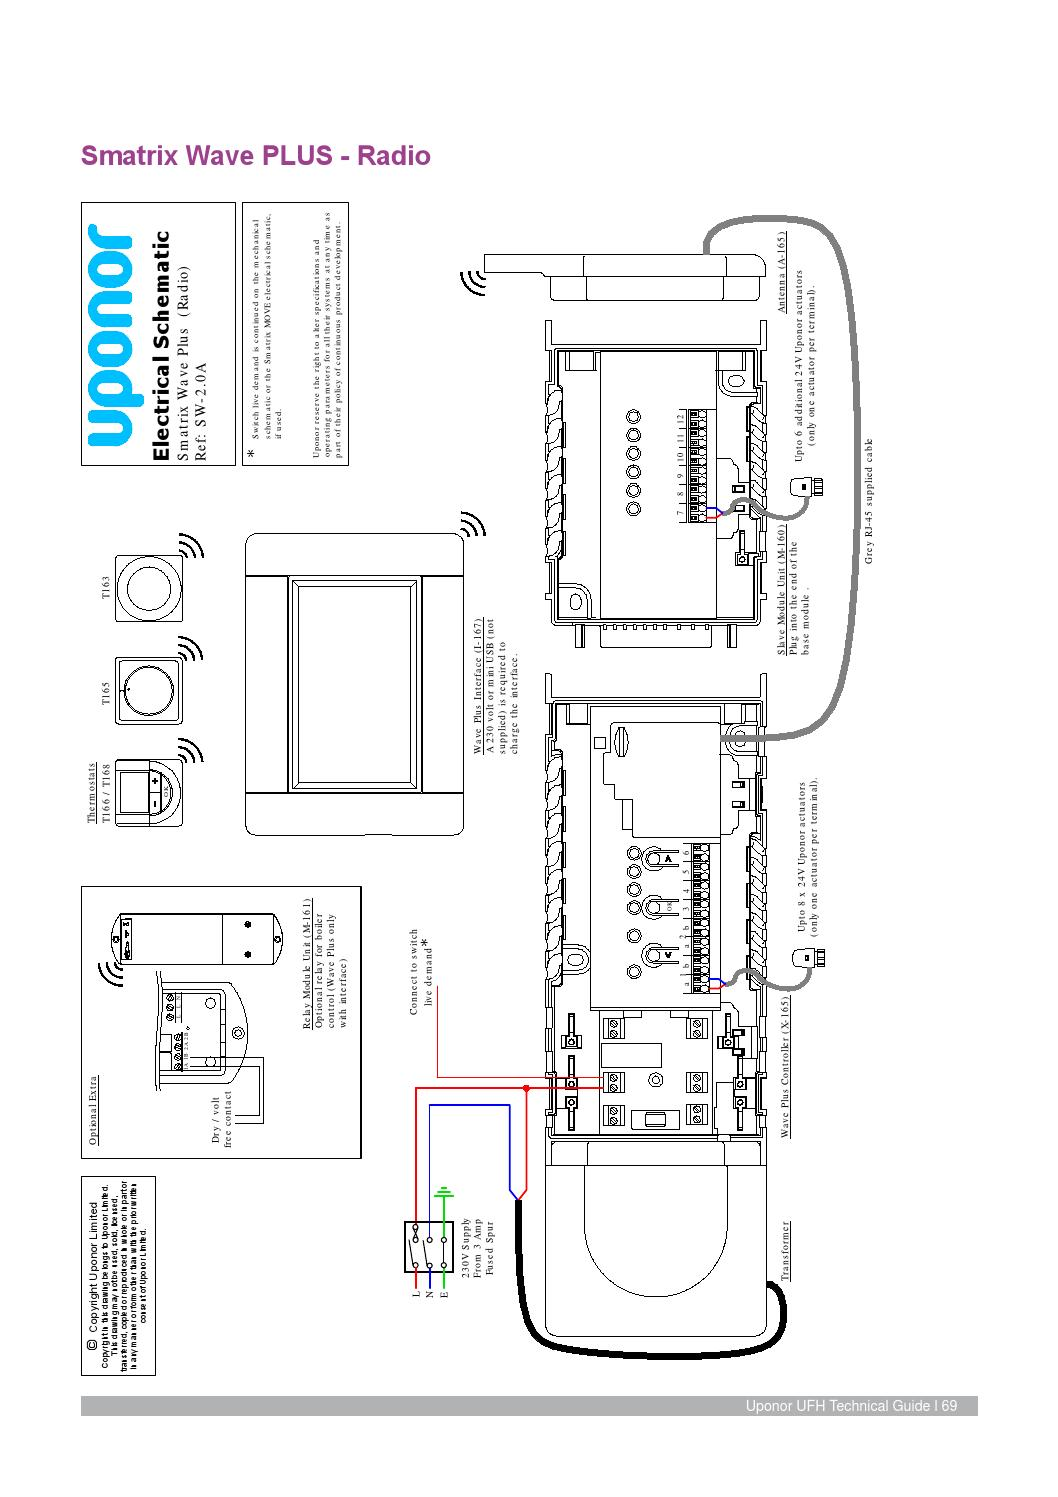 Wirsbo Underfloor Heating Wiring Diagram - Amplifier Circuit Diagrams -  audi-a3.yenpancane.jeanjaures37.fr | Wirsbo Underfloor Heating Wiring Diagram |  | Wiring Diagram Resource